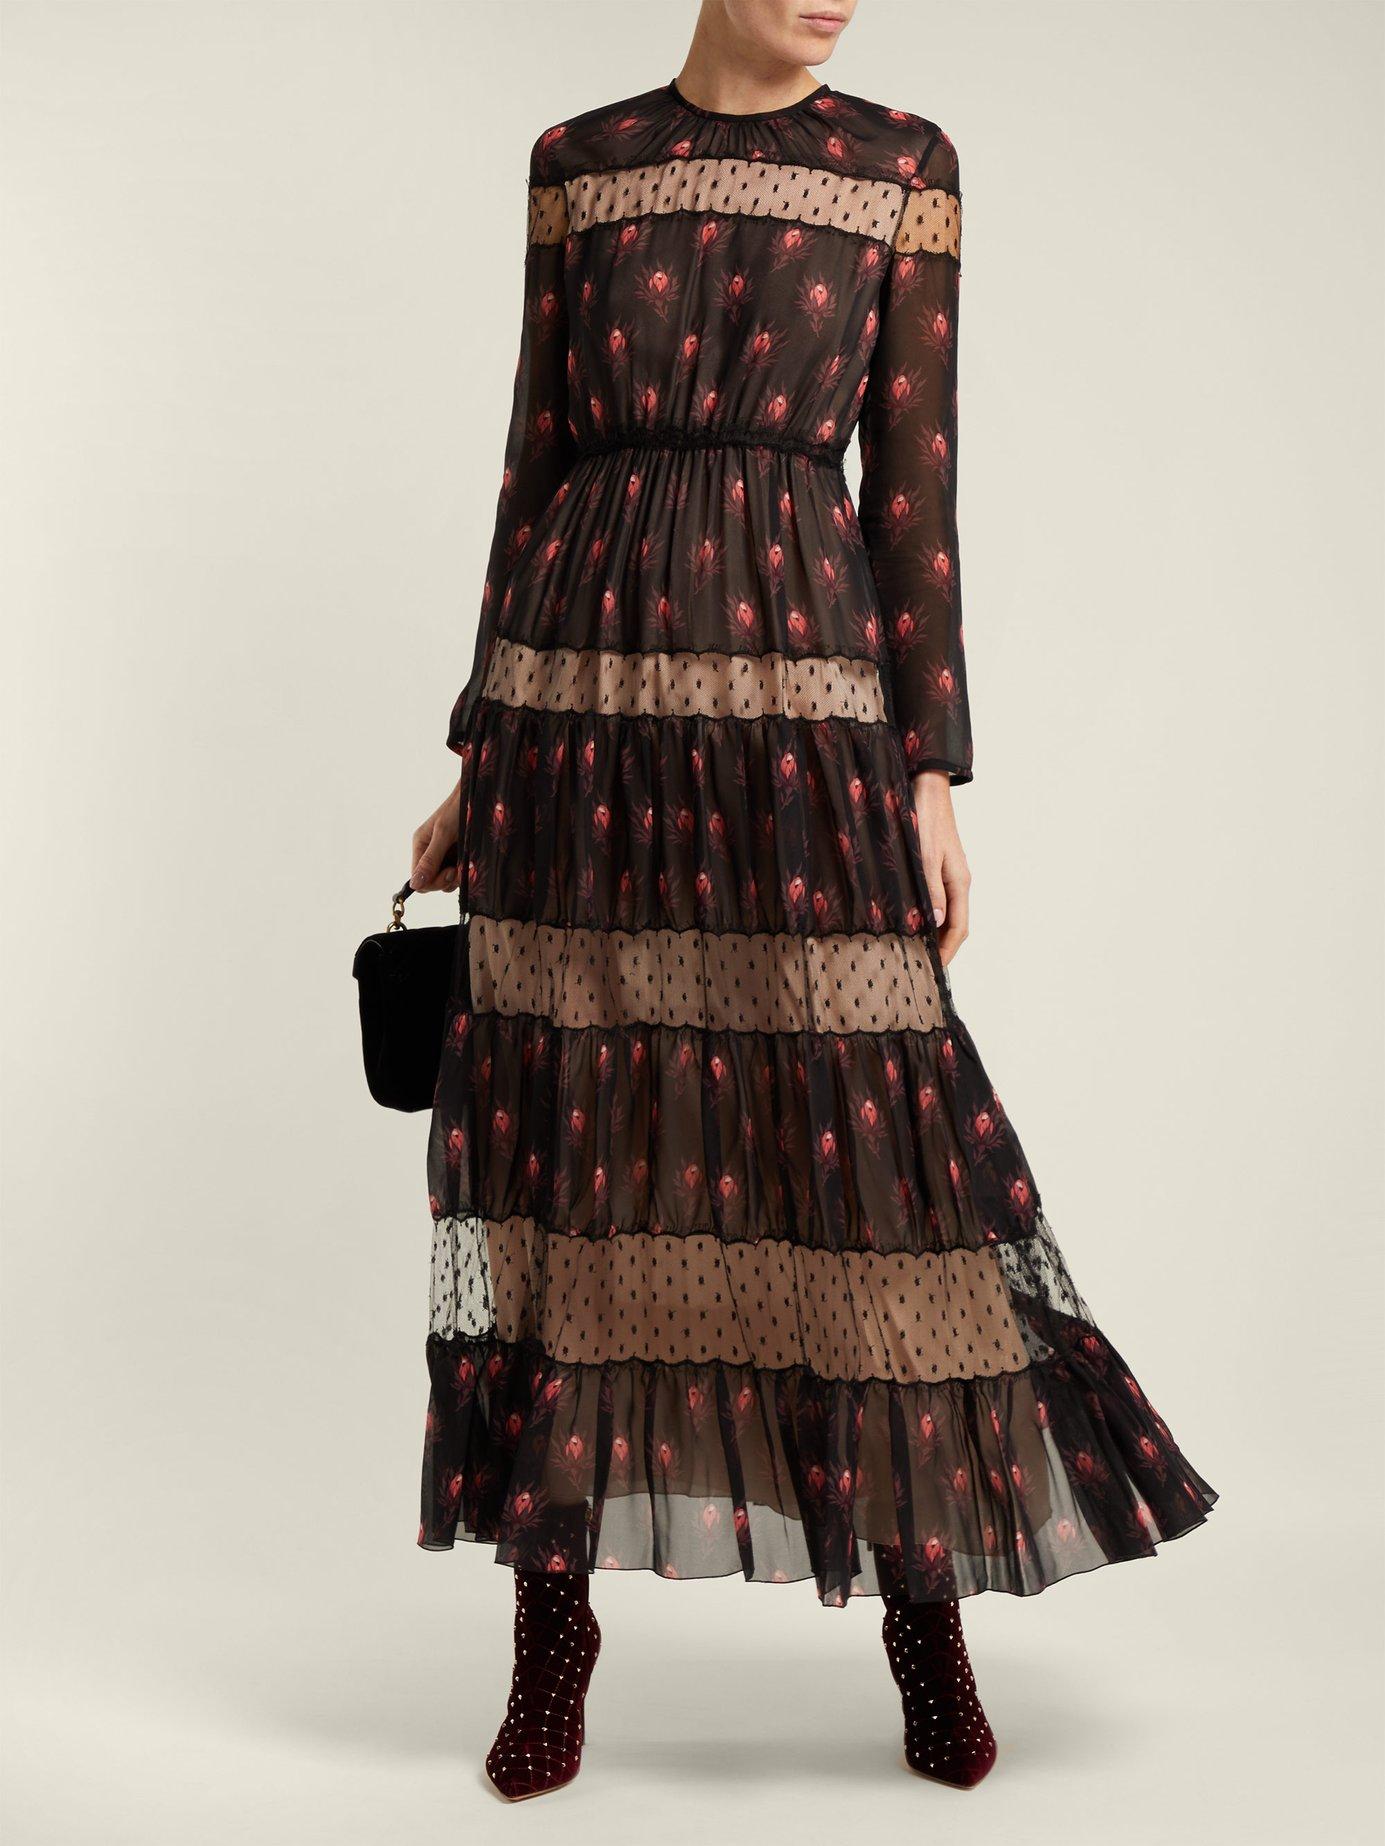 Rosebud-print silk-chiffon dress by Giambattista Valli